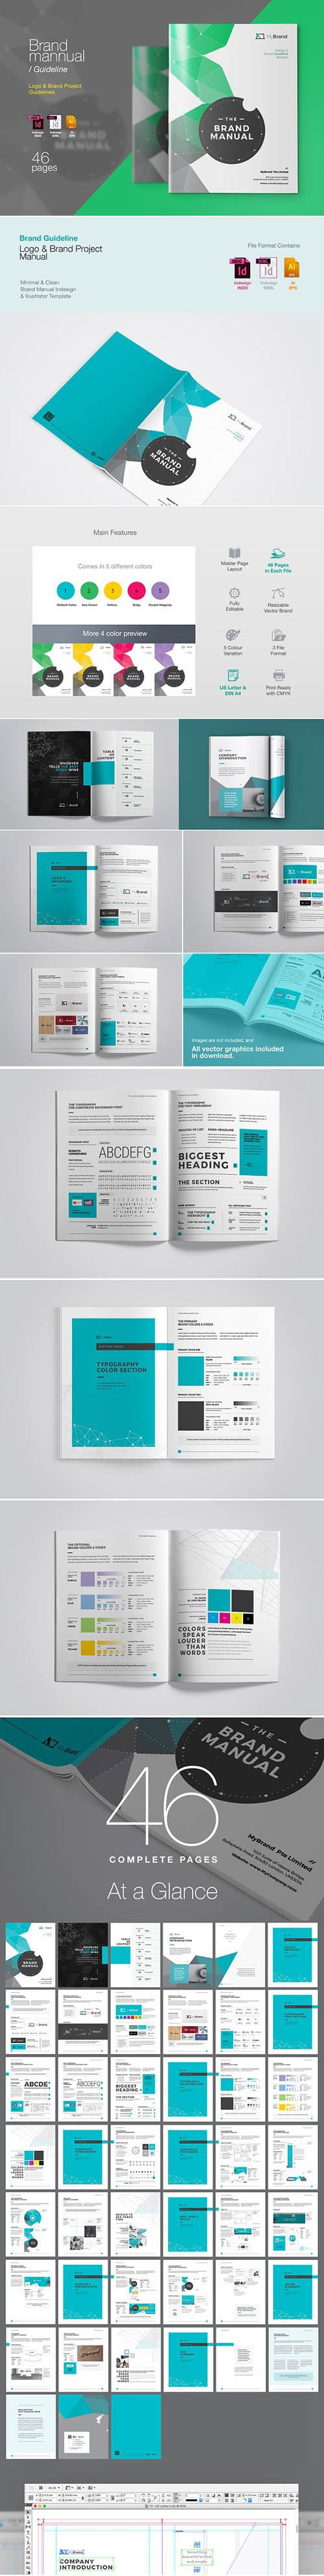 CreativeMarket - Brand Guideline Brochure 3370193